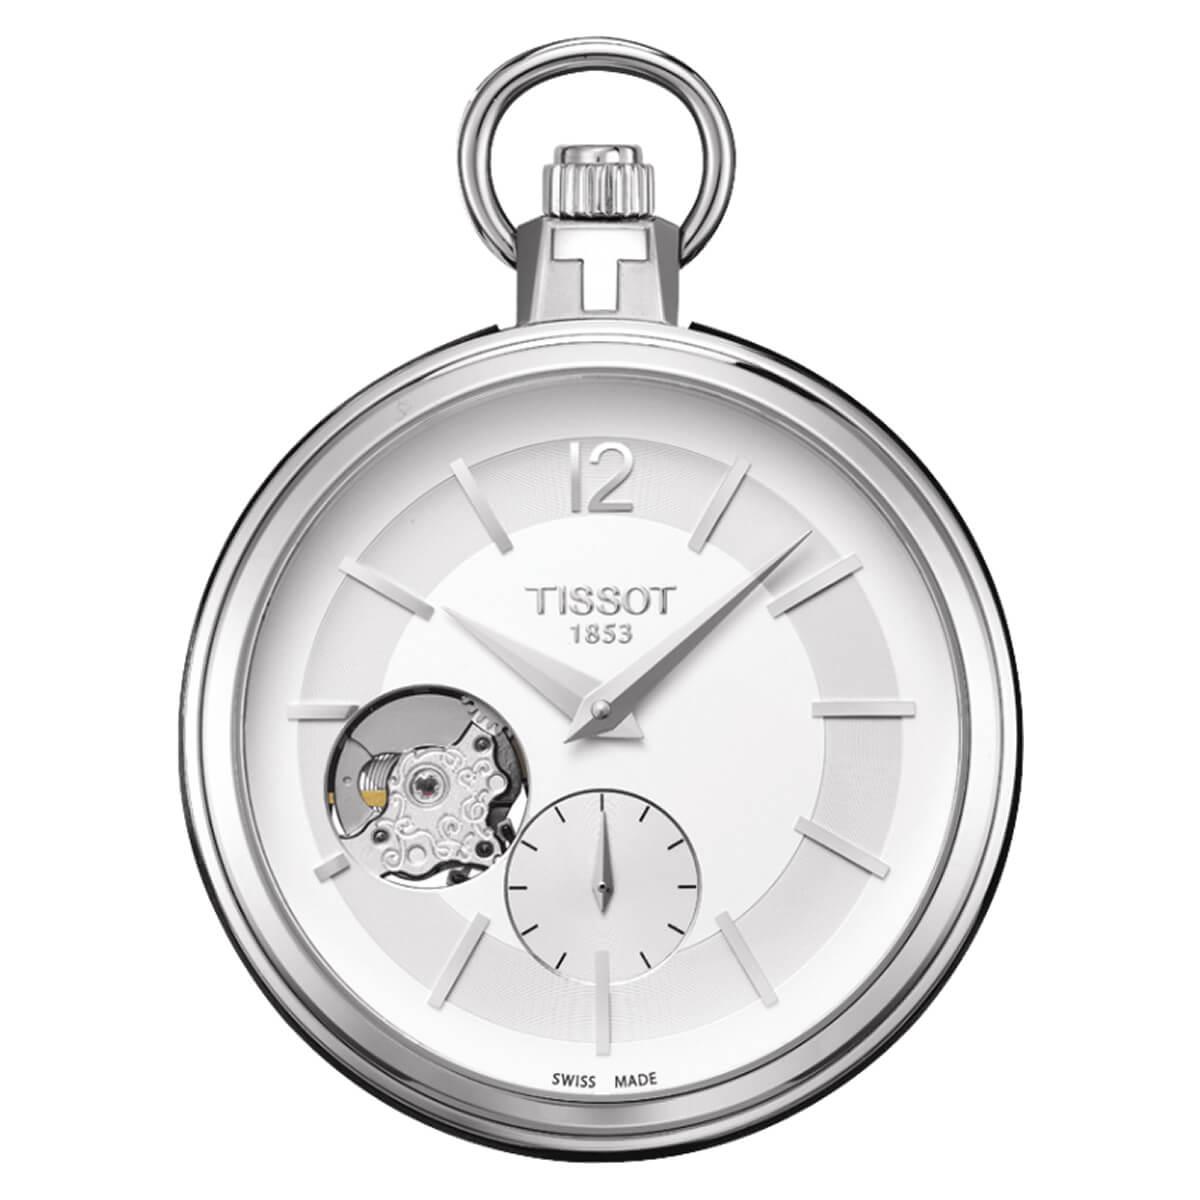 TISSOT/ティソ/オープンハート/ブラックレザー/T854.405.19.037.01 懐中時計